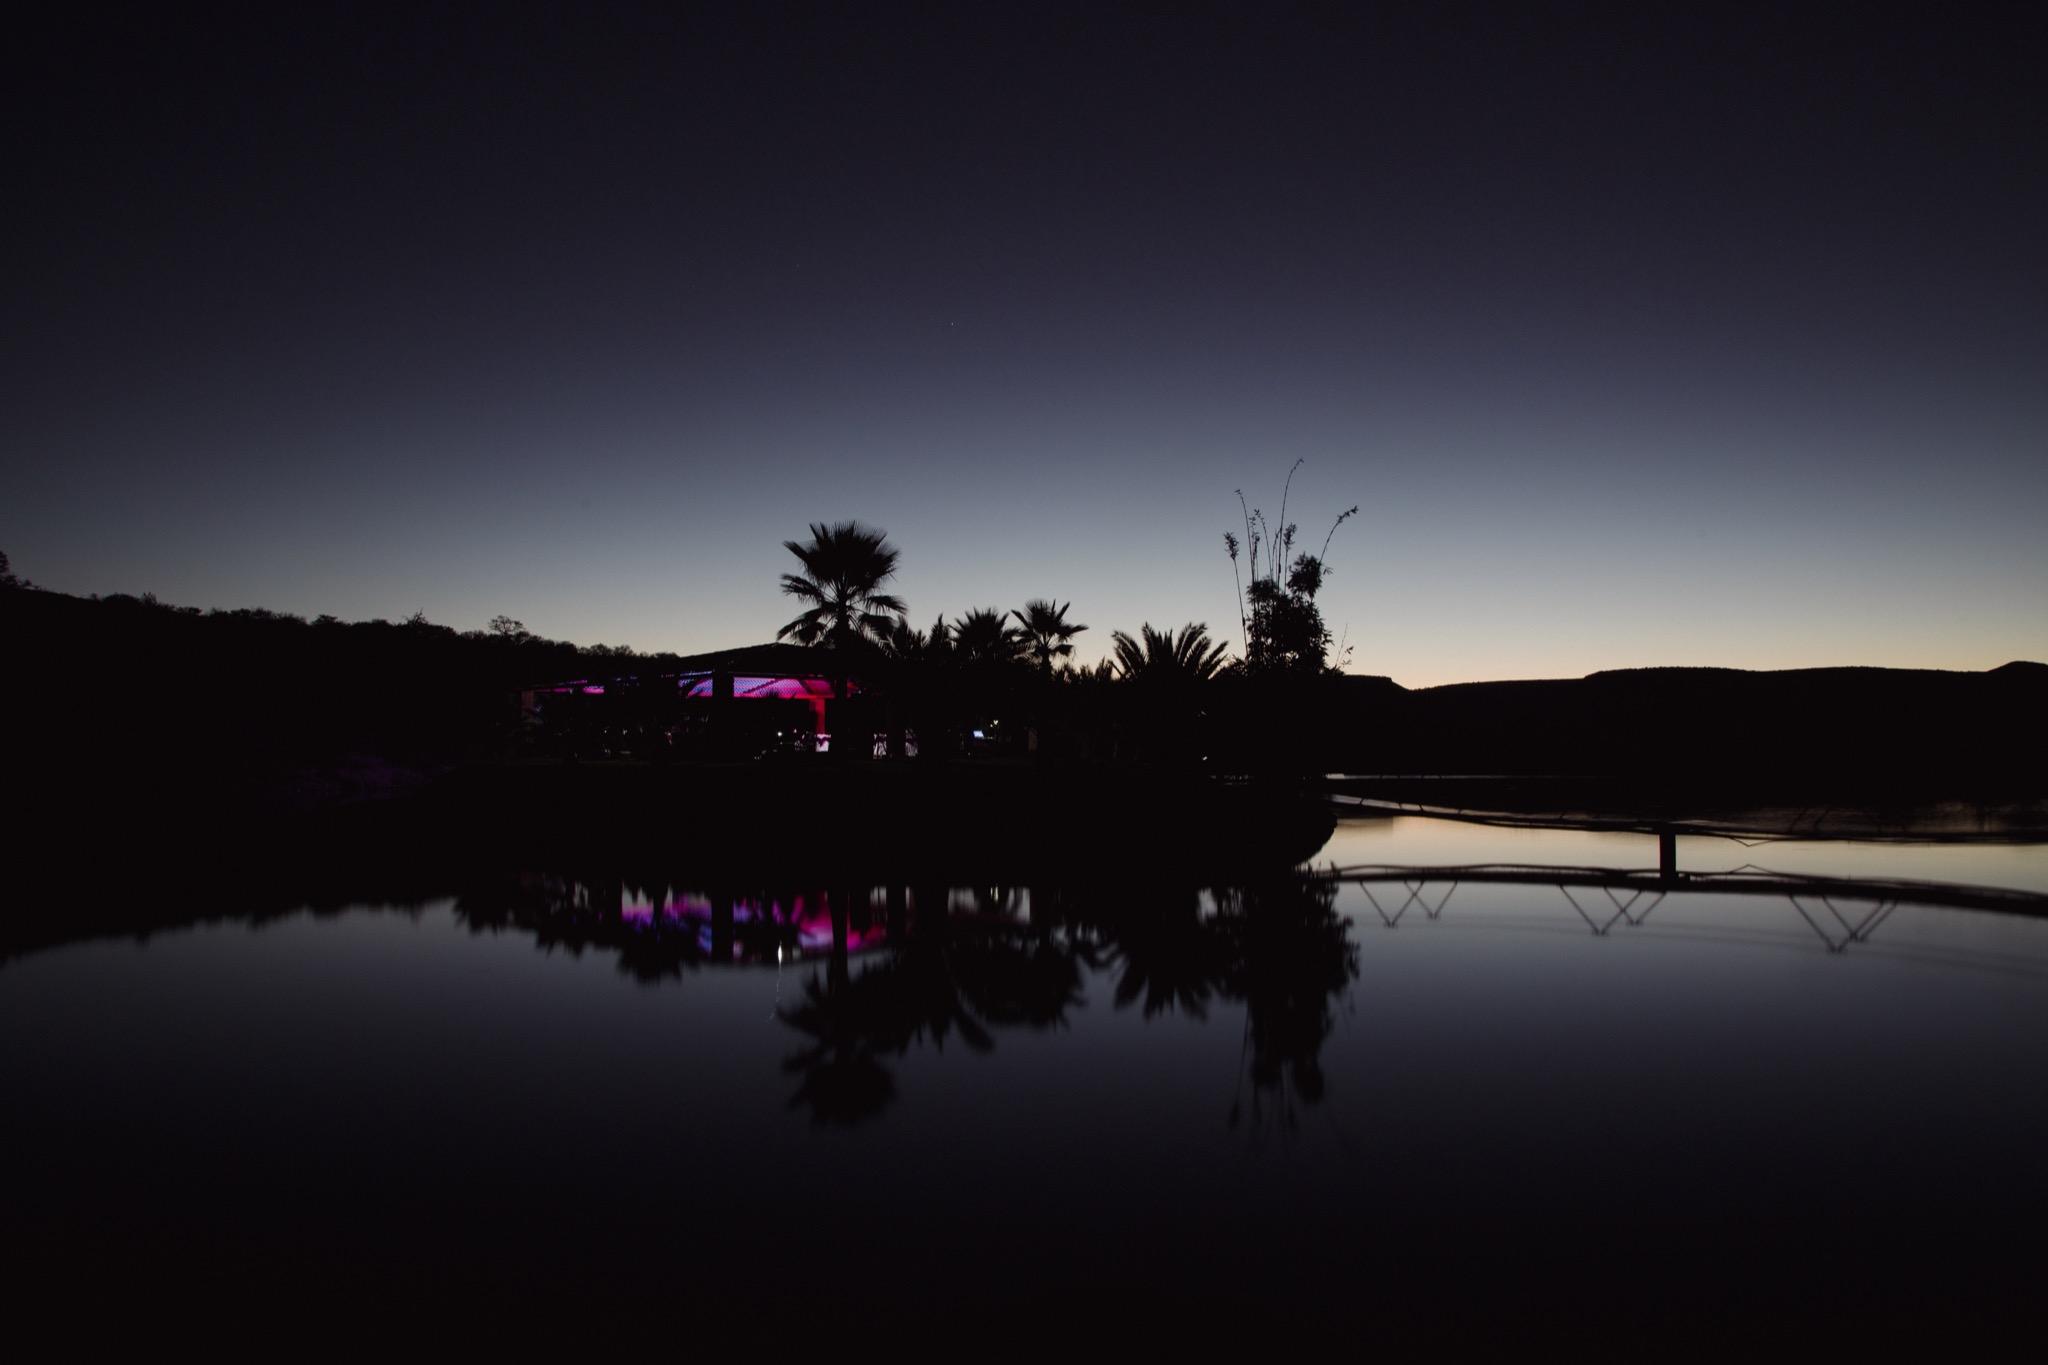 javier_noriega_fotografo_profesional_bodas_zacatecas_mexico_chihuahua_photographer_22